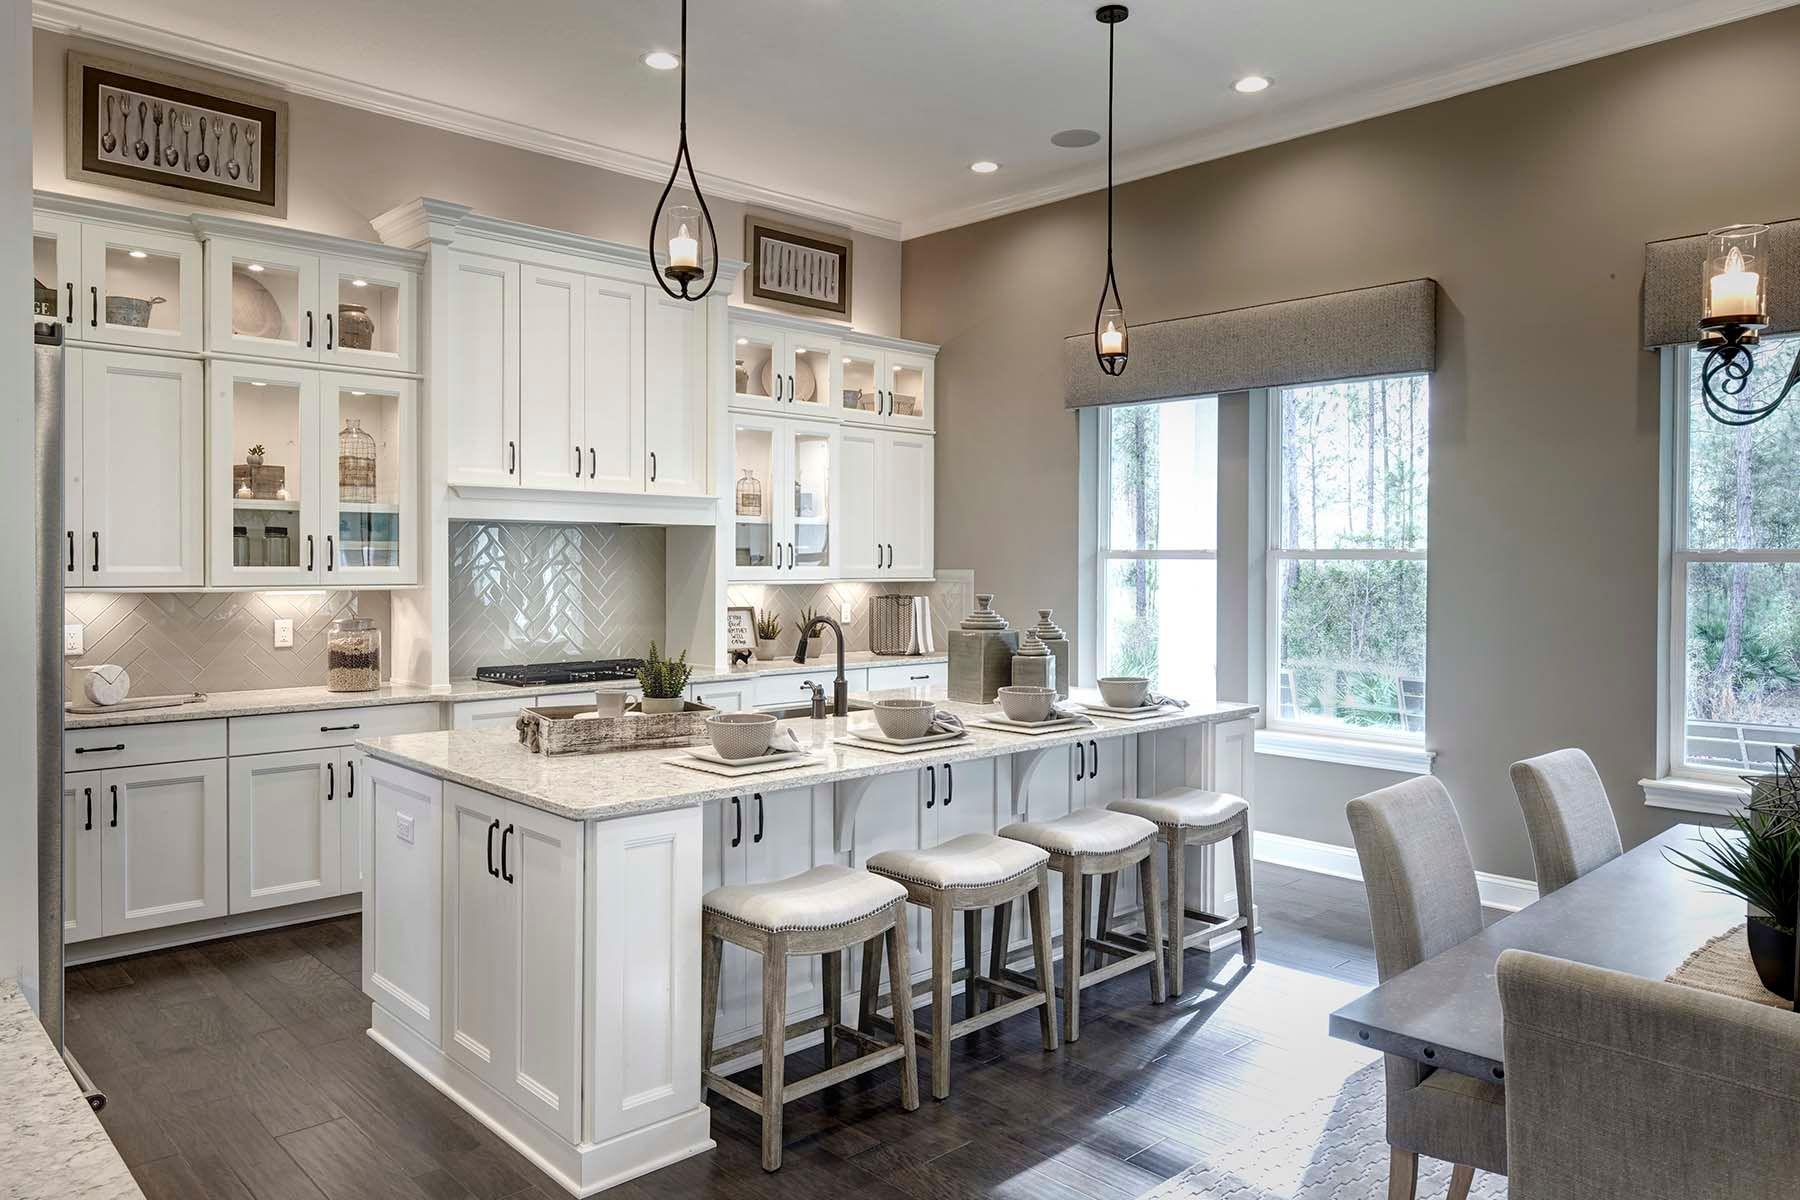 Kitchen featured in the Iris By Mattamy Homes in Jacksonville-St. Augustine, FL